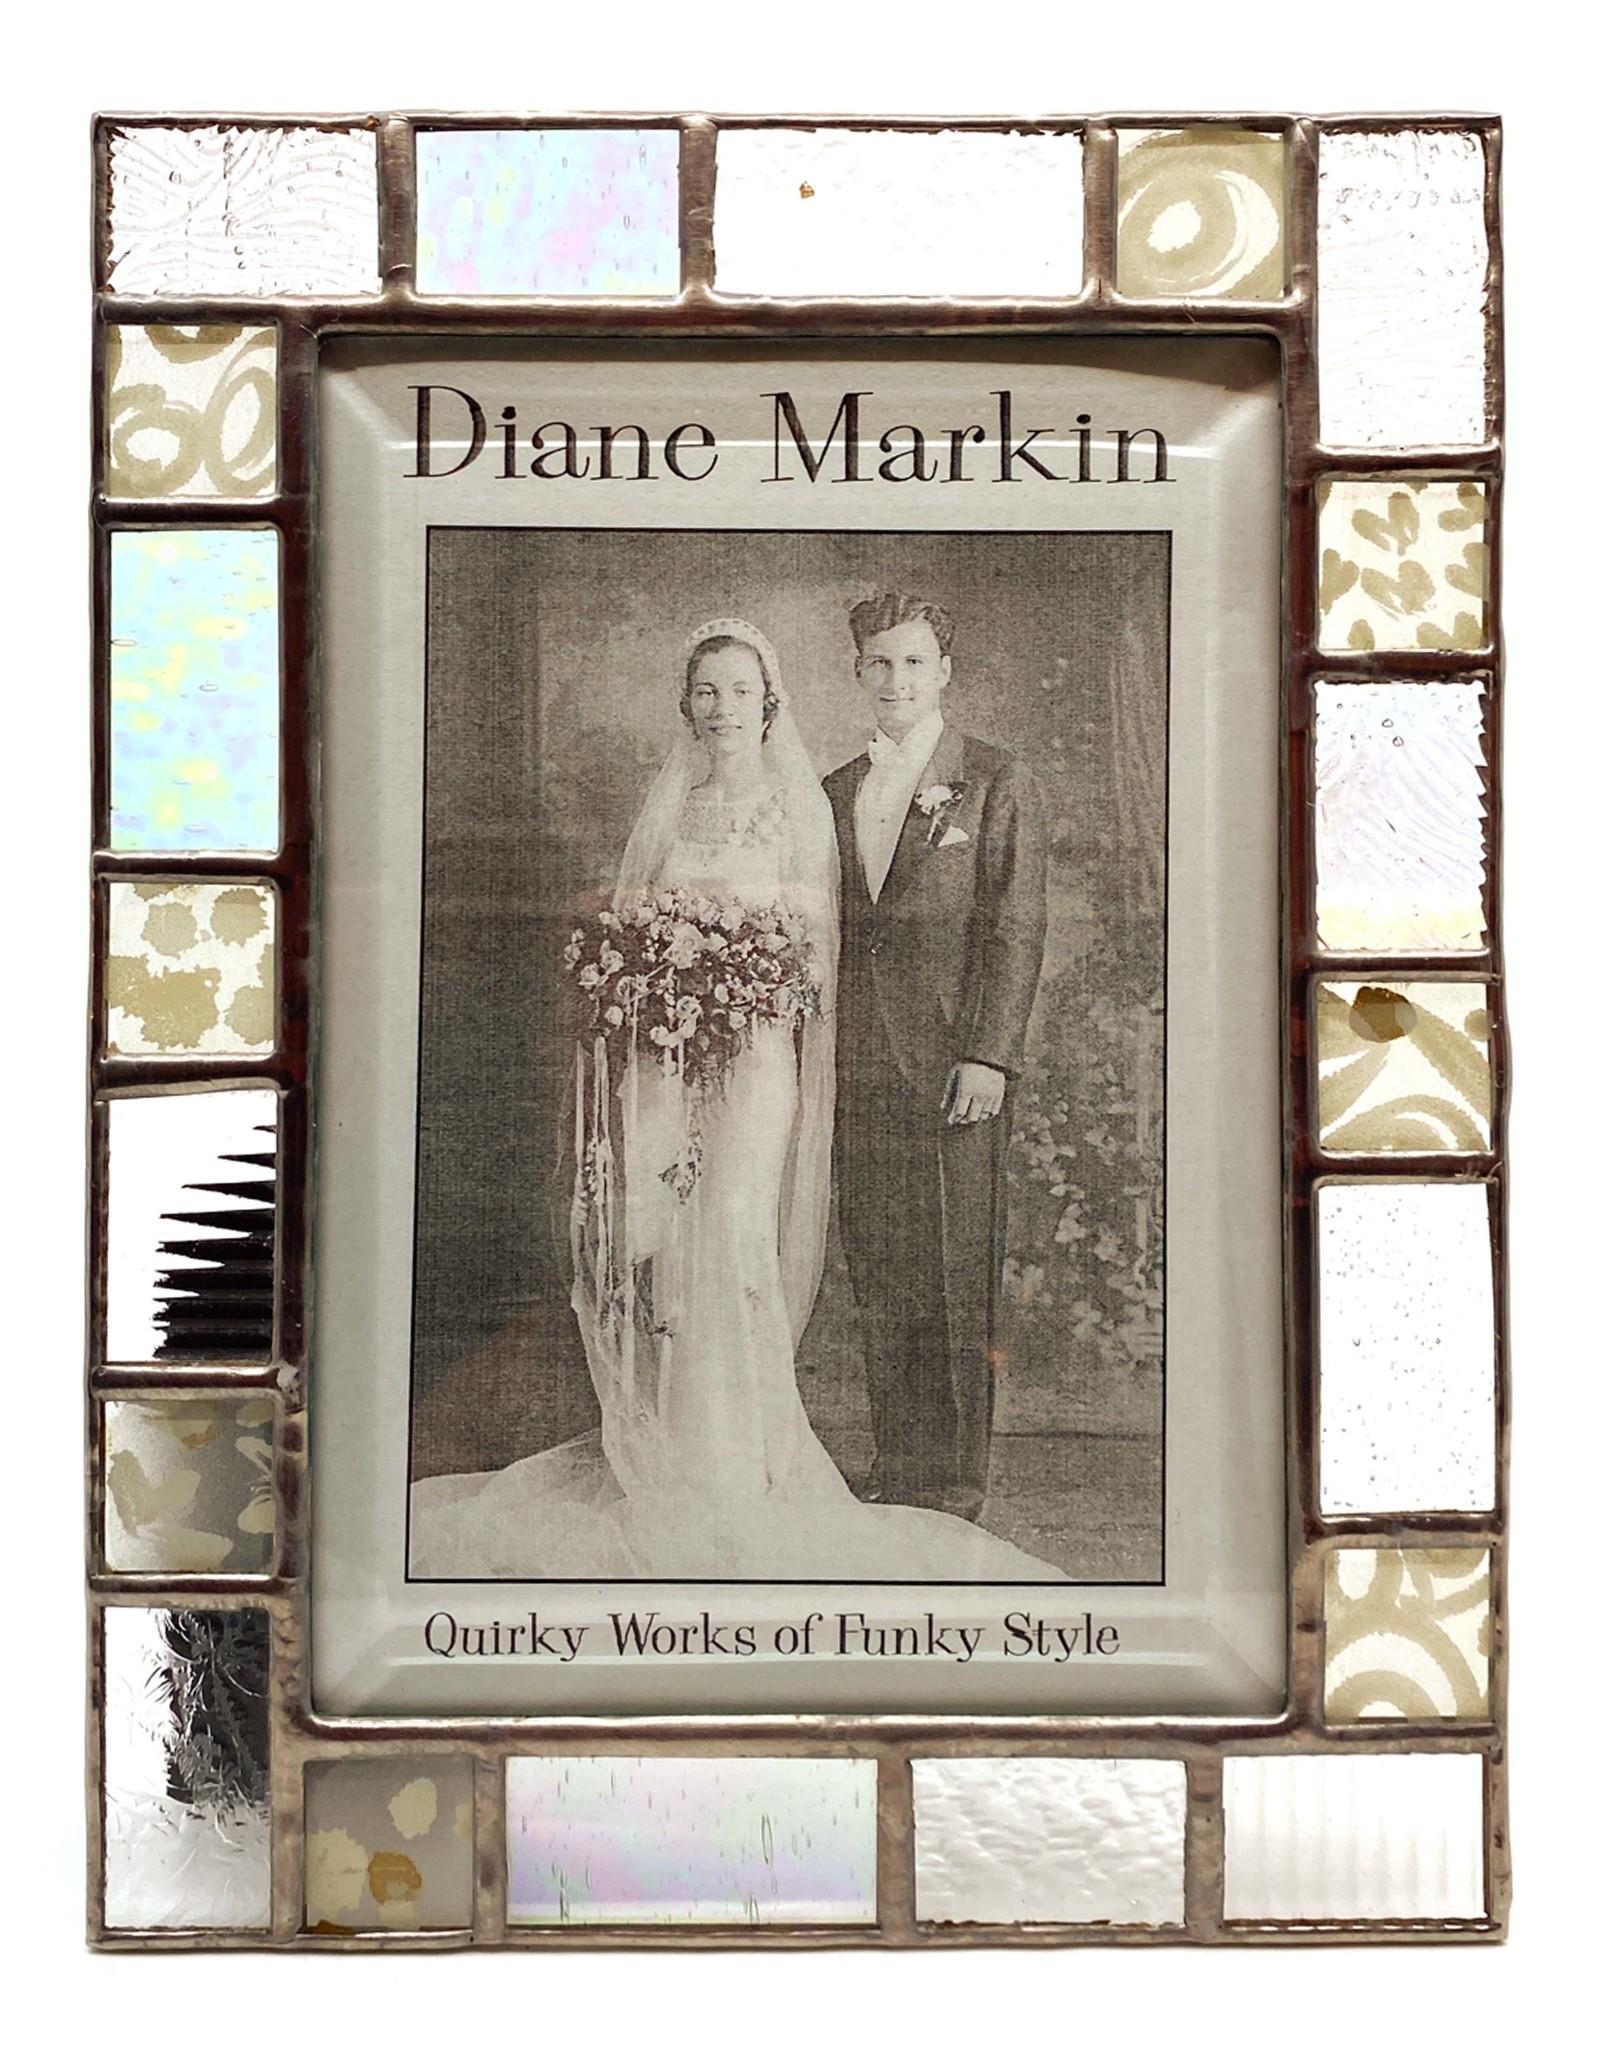 DIANE MARKIN 5X7 PETIT FOUR CLEAR PICTURE FRAME